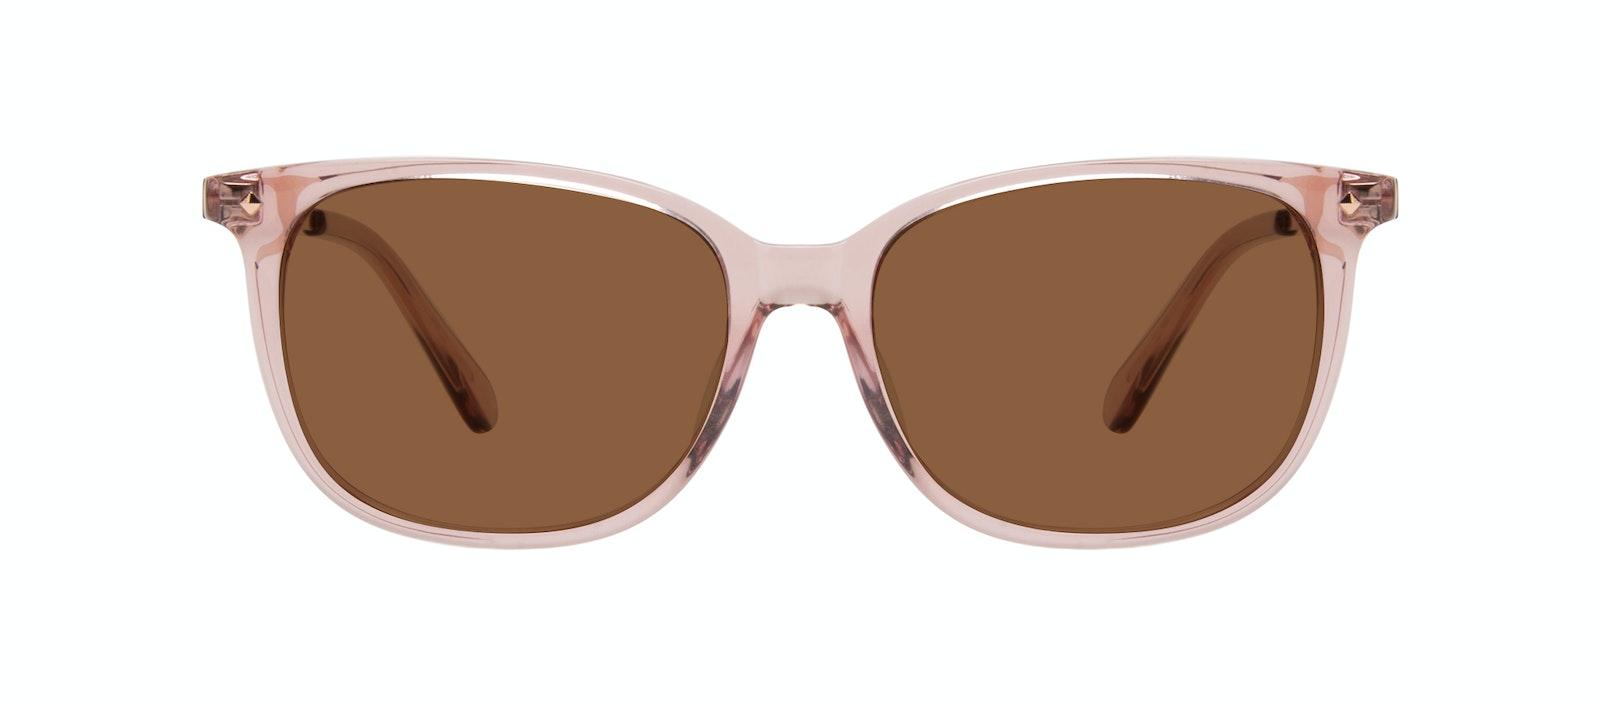 Affordable Fashion Glasses Square Sunglasses Women Refine Petite Rose Front